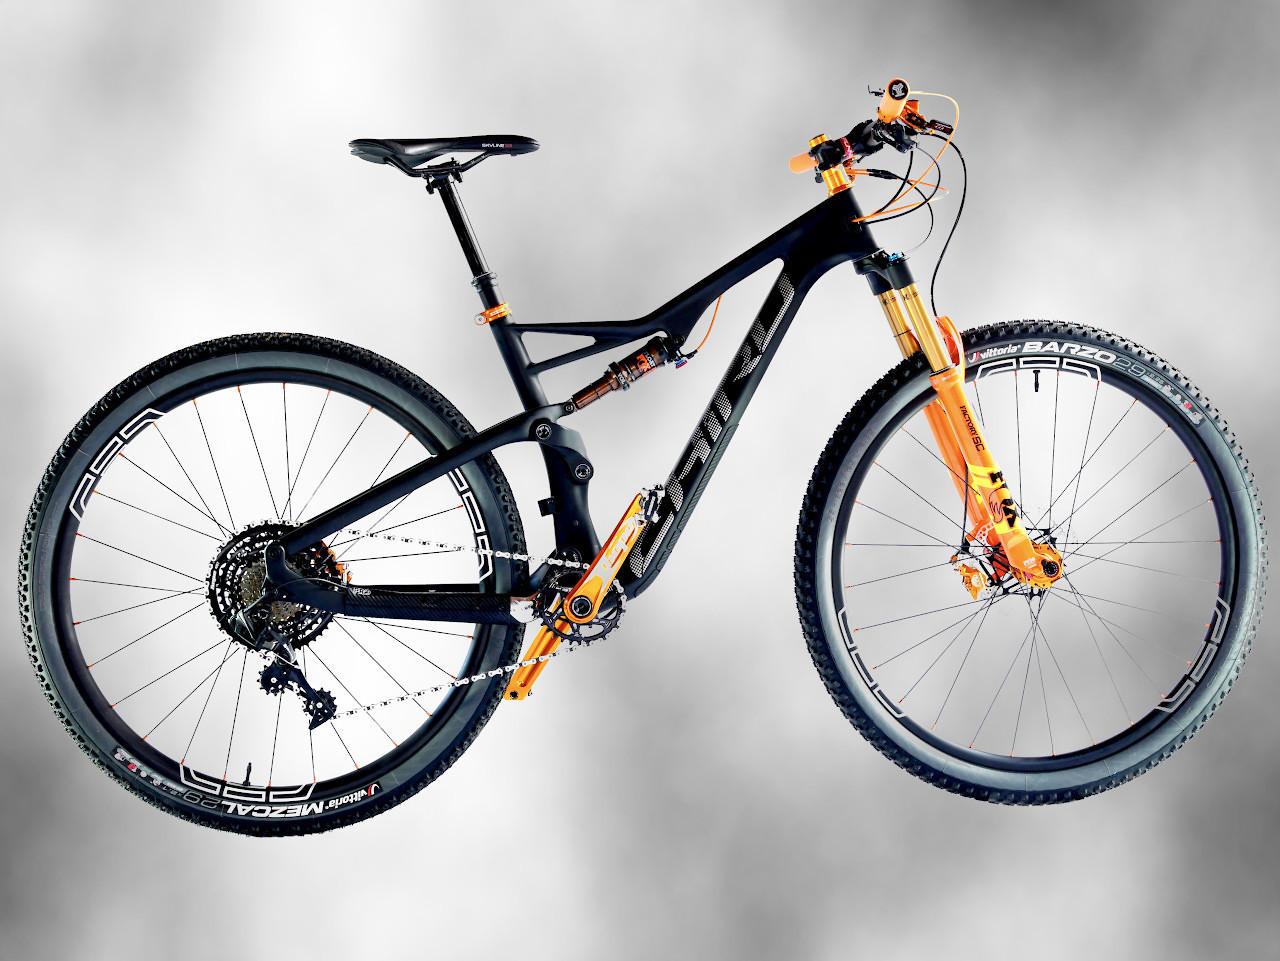 Chiru Rangi Rangi - 2018 Vital Bike of the Day Collection